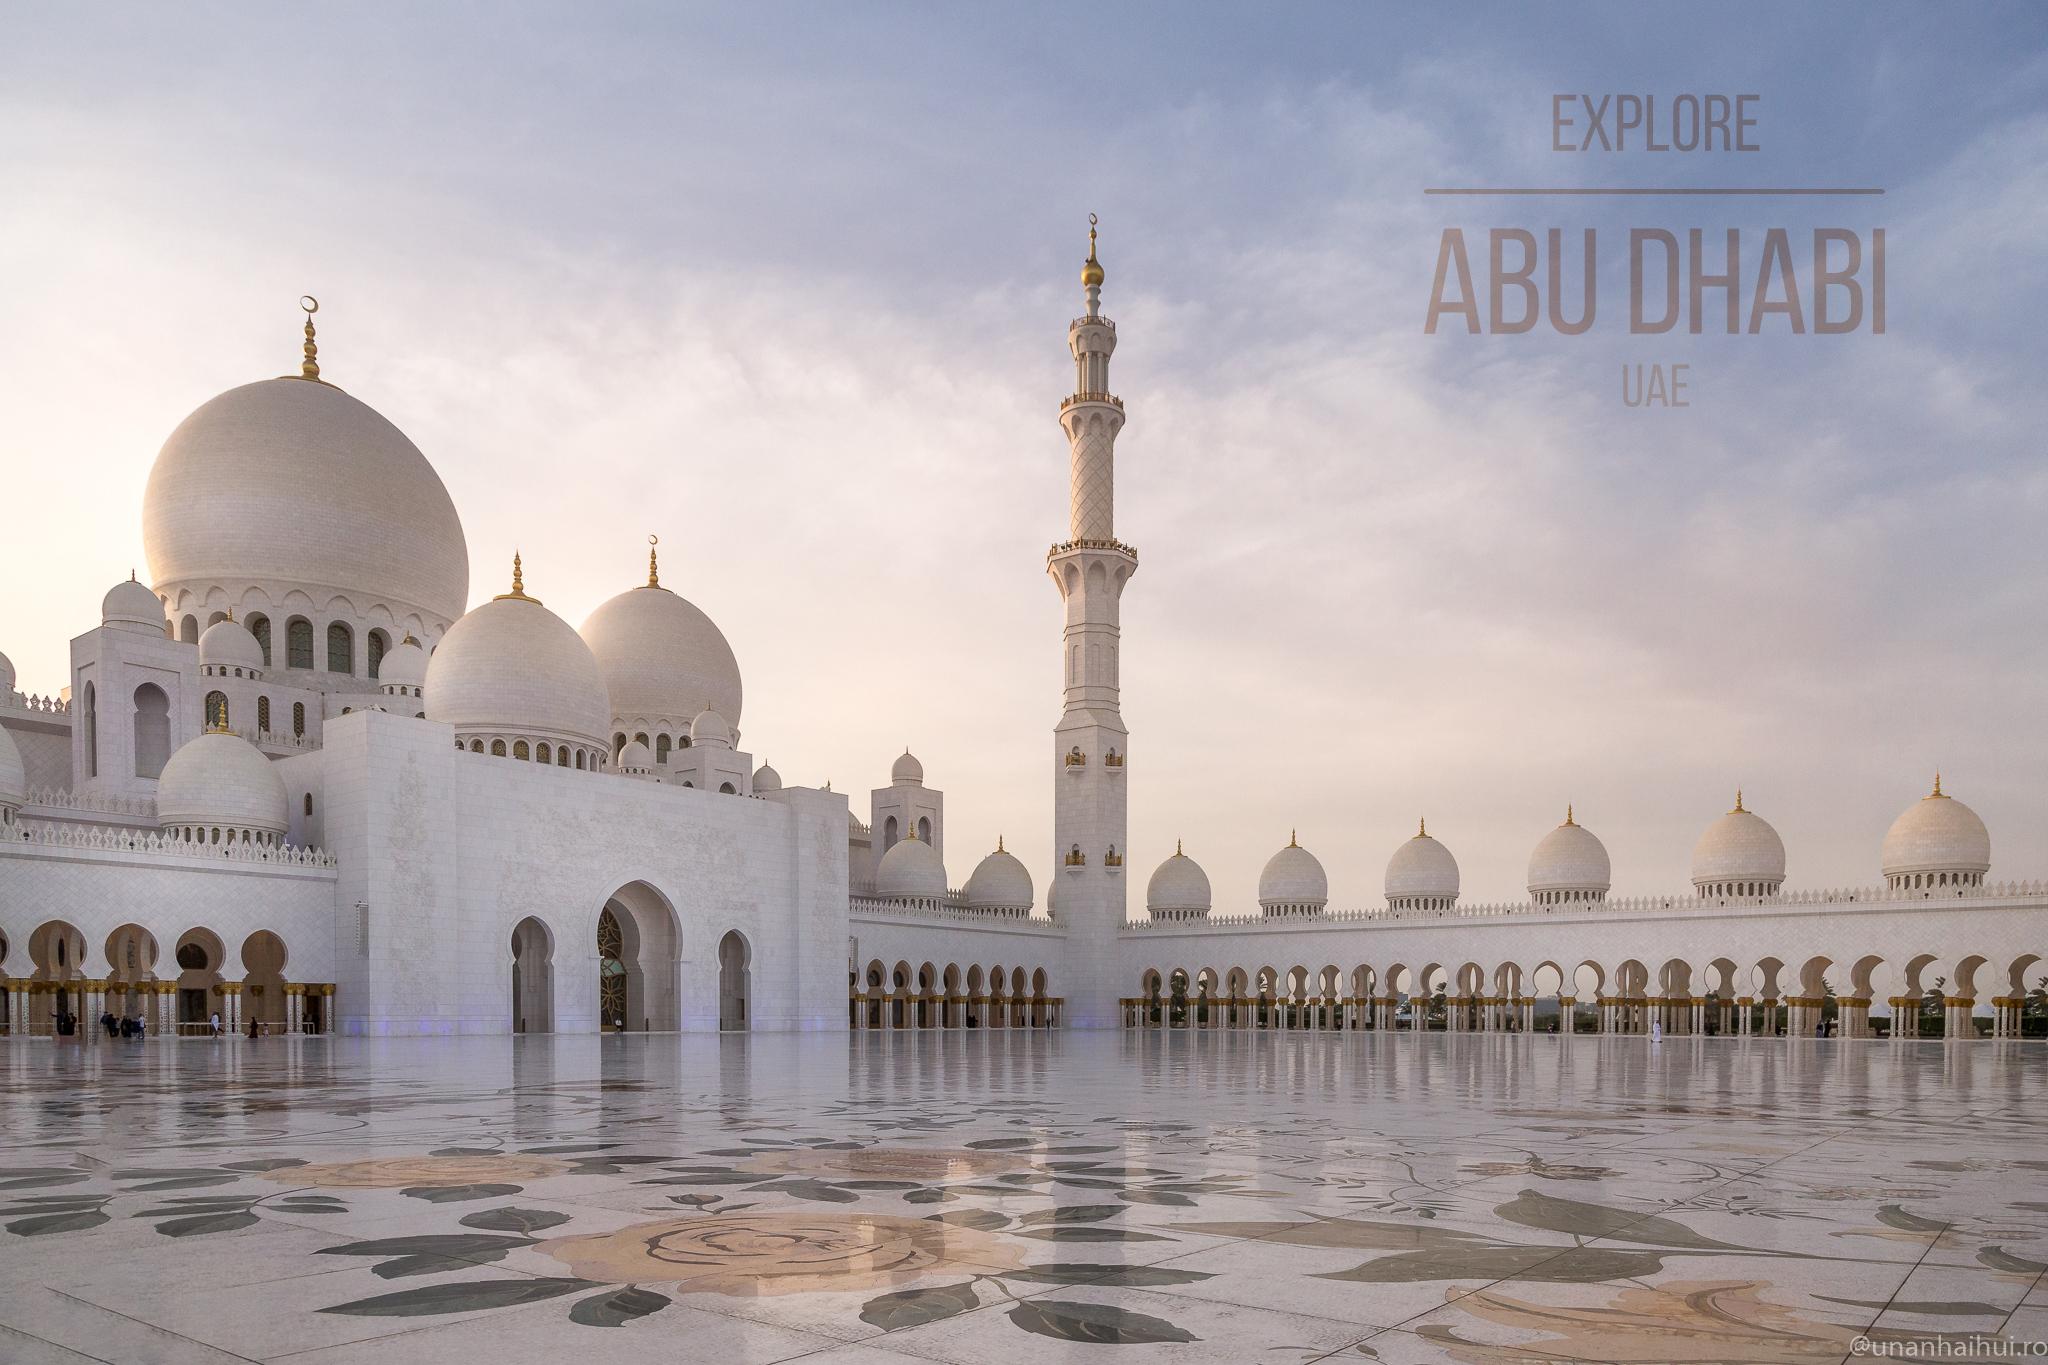 Abu Dhabi și relația sa cu arhitectura